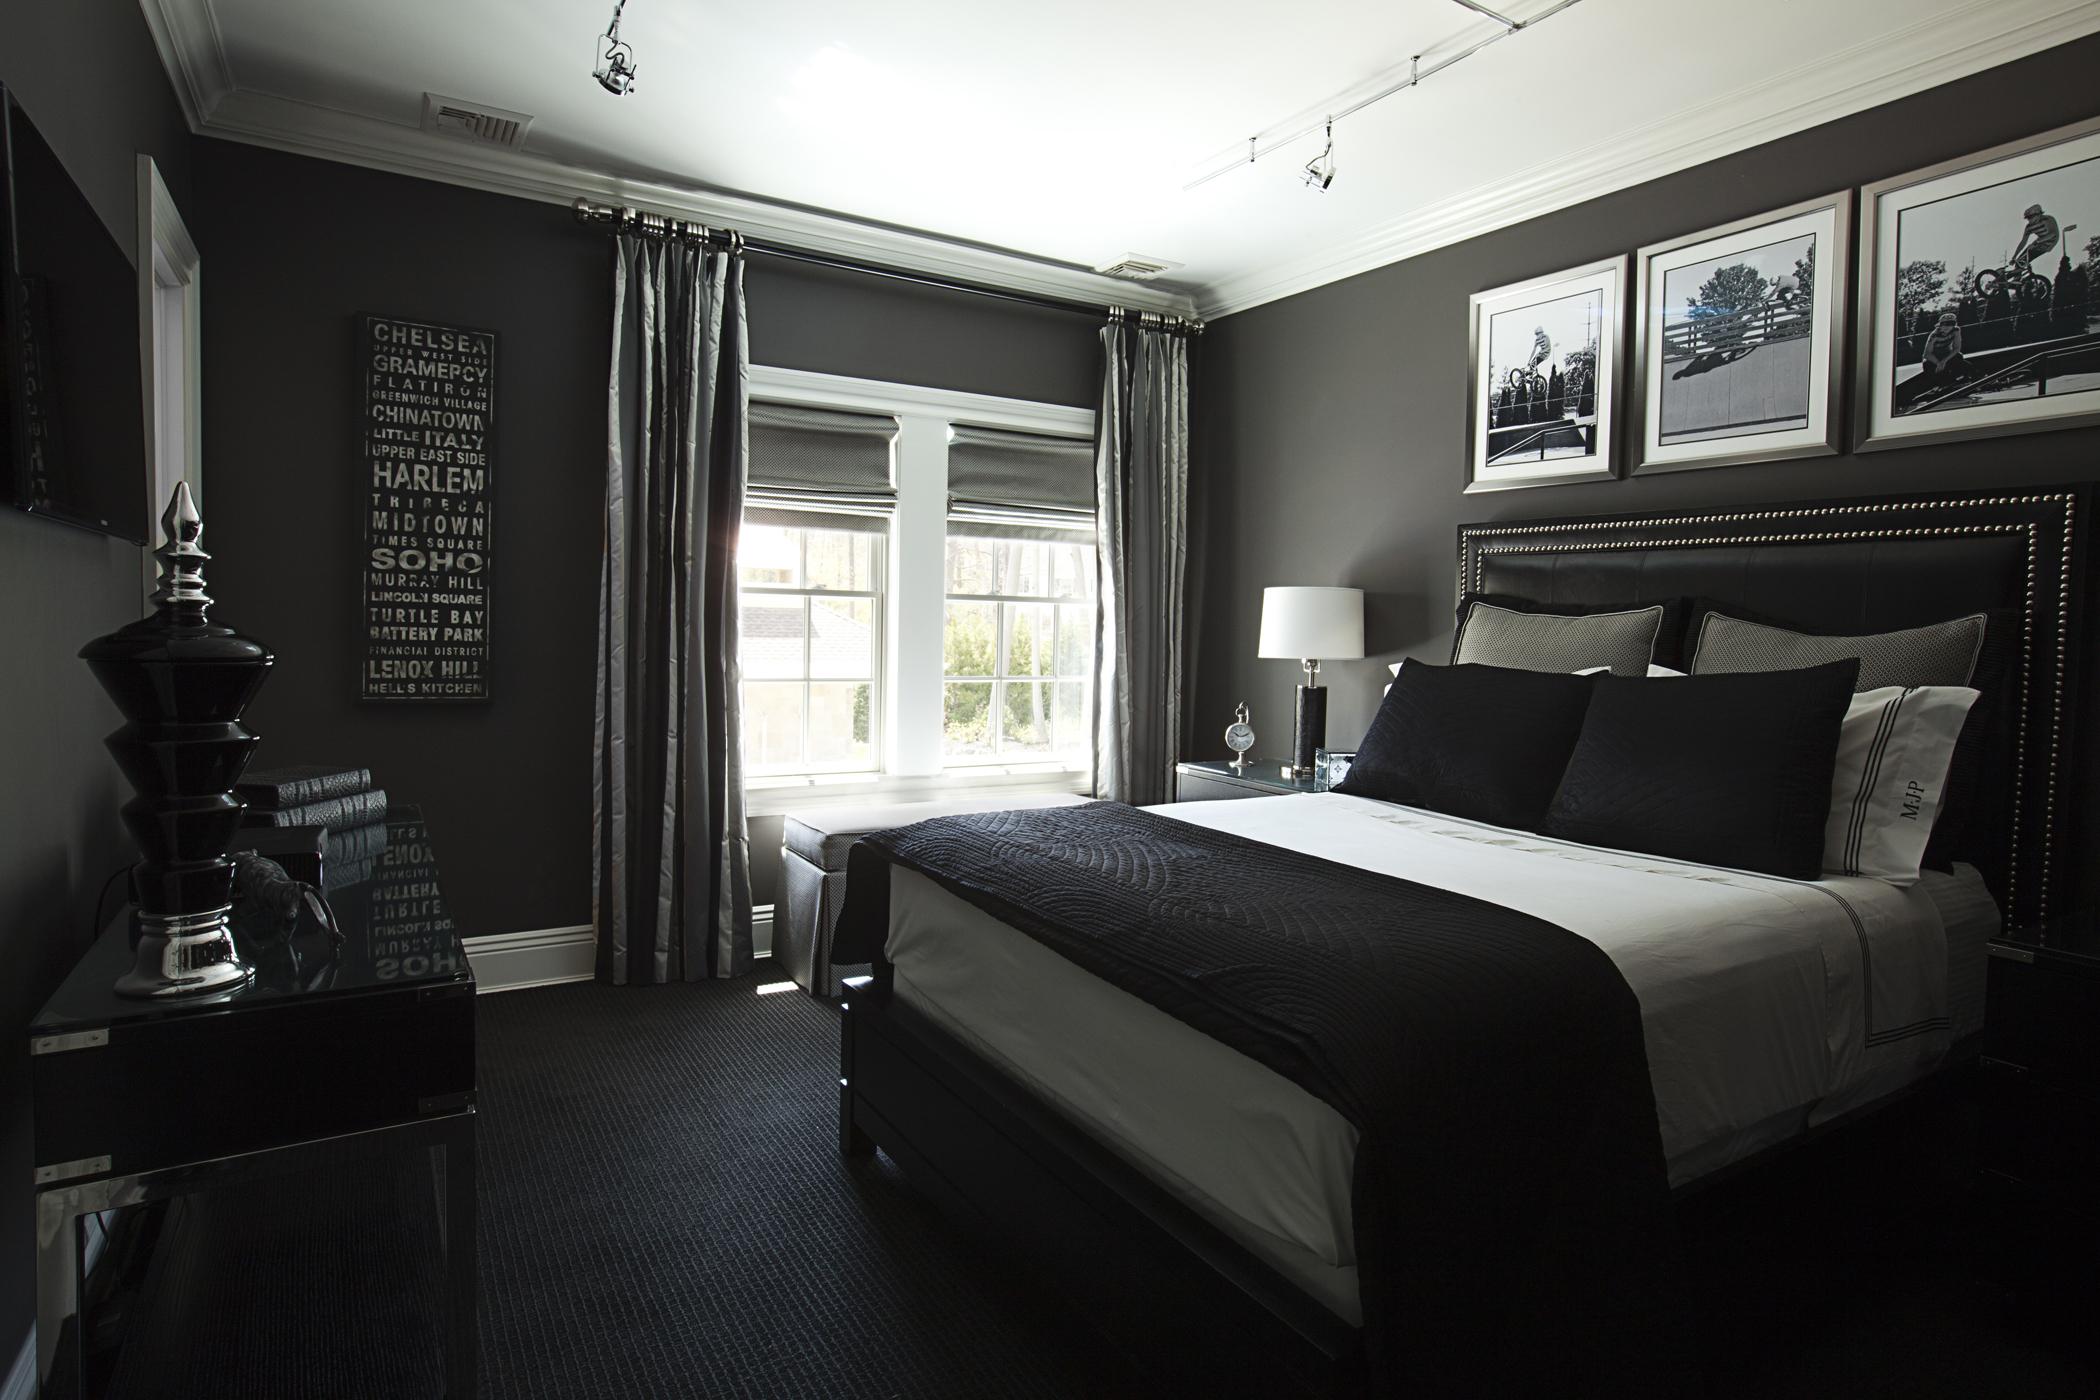 Interiors_Male Bedroom.jpg